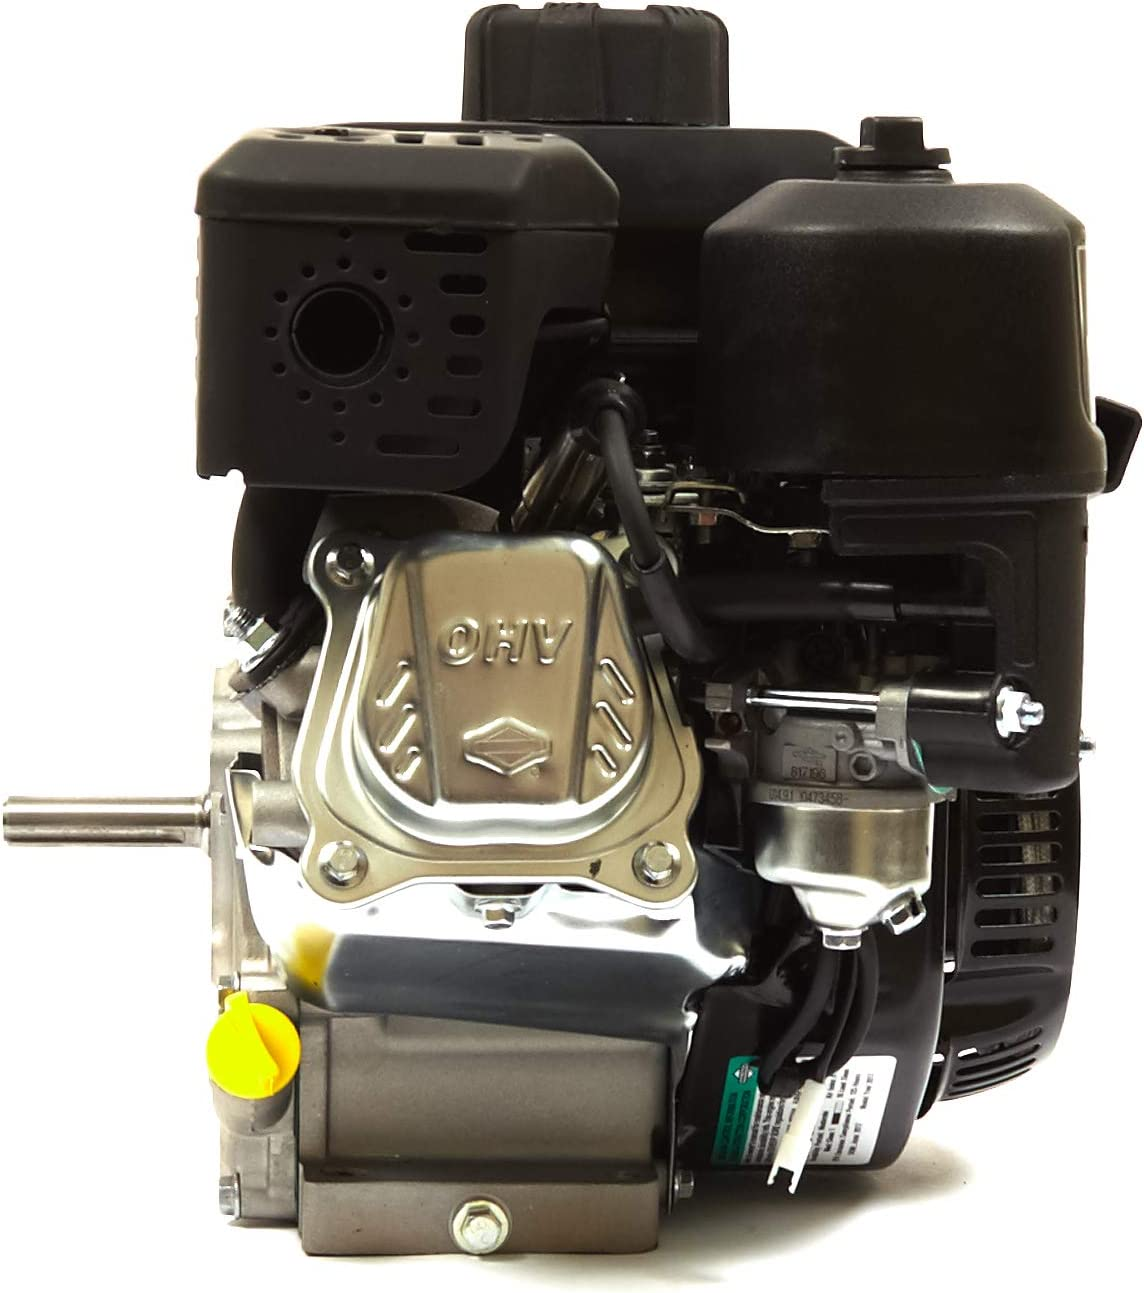 Briggs and Stratton 83132-1040-F1 550 Series 127cc Engine Farm ...